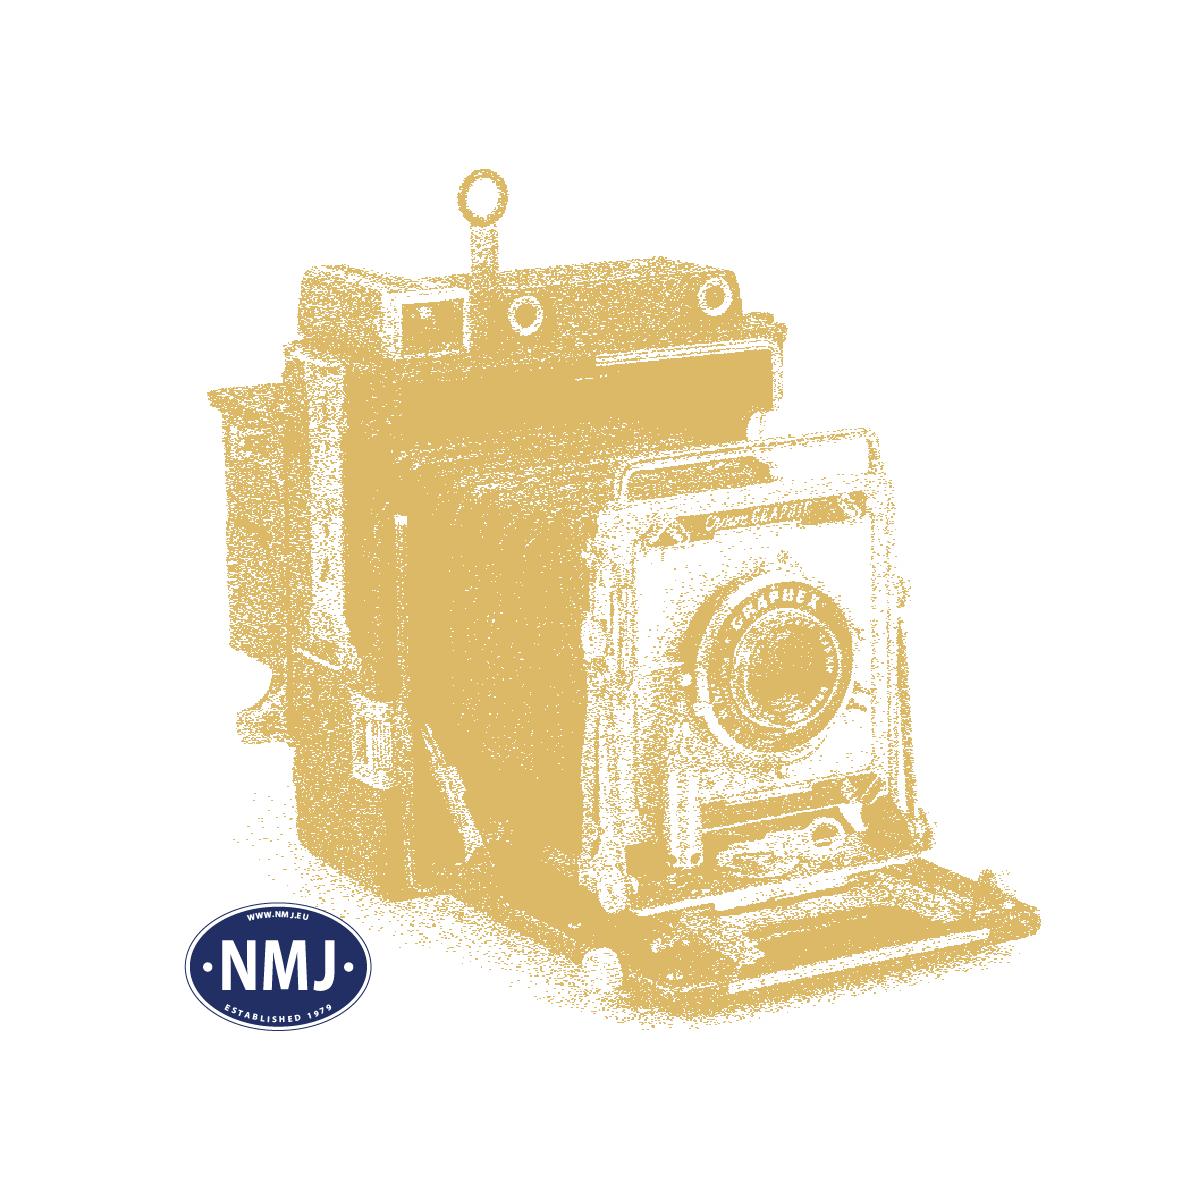 NMJT601.201 - NMJ Topline TGOJ Os 21 74 370 6 049-4